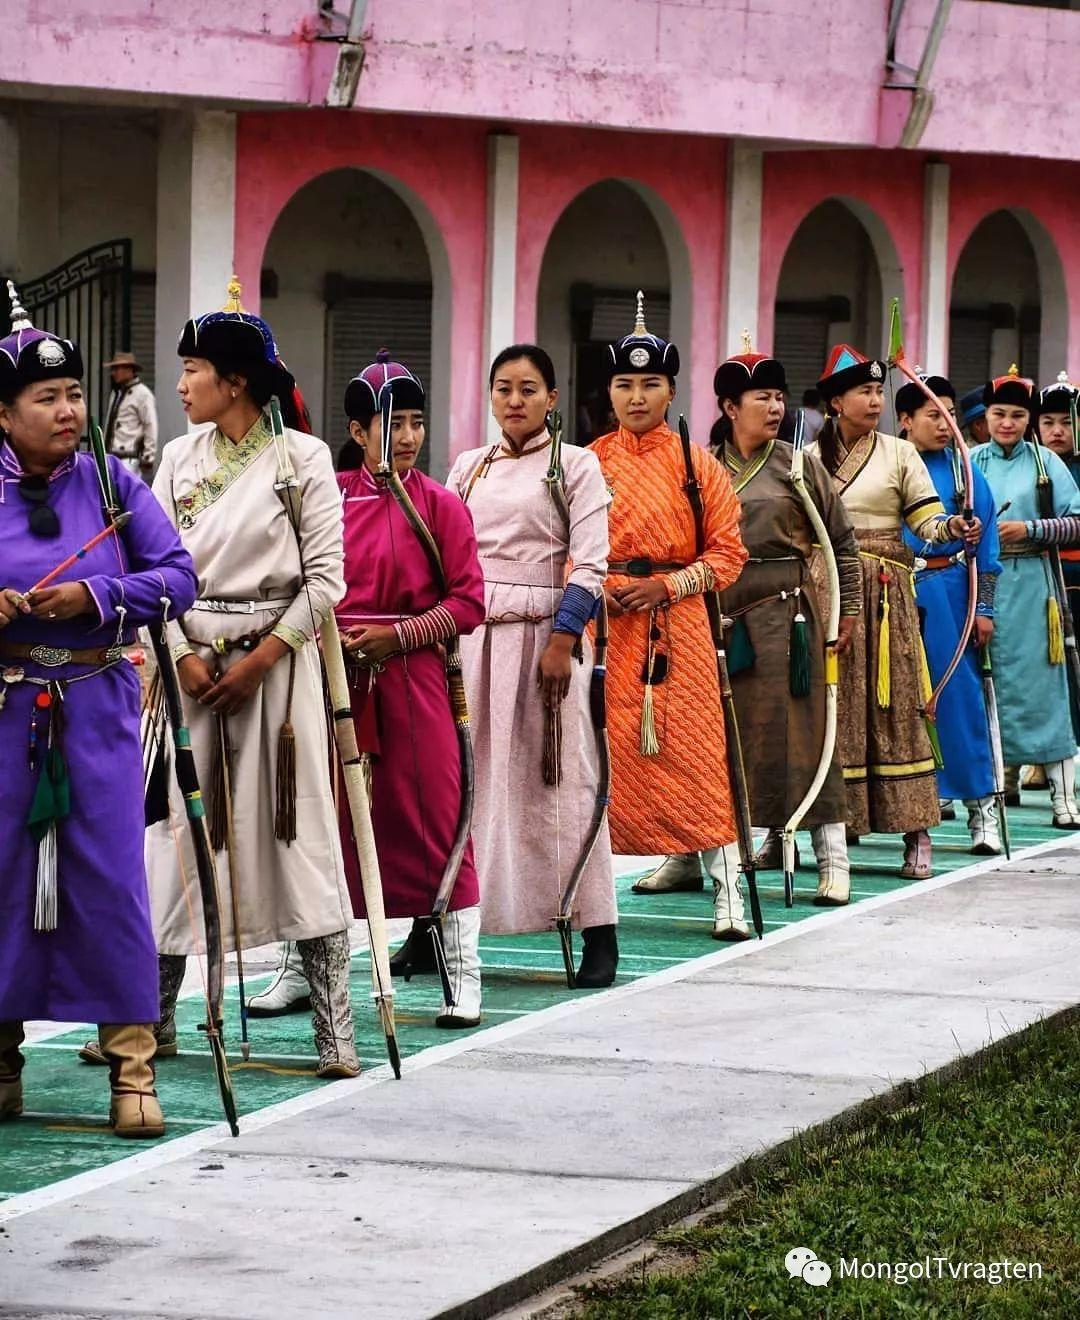 ᠮᠣᠩᠭᠣᠯ ᠨᠠᠭᠠᠳᠣᠮ 那达慕 第30张 ᠮᠣᠩᠭᠣᠯ ᠨᠠᠭᠠᠳᠣᠮ 那达慕 蒙古文化